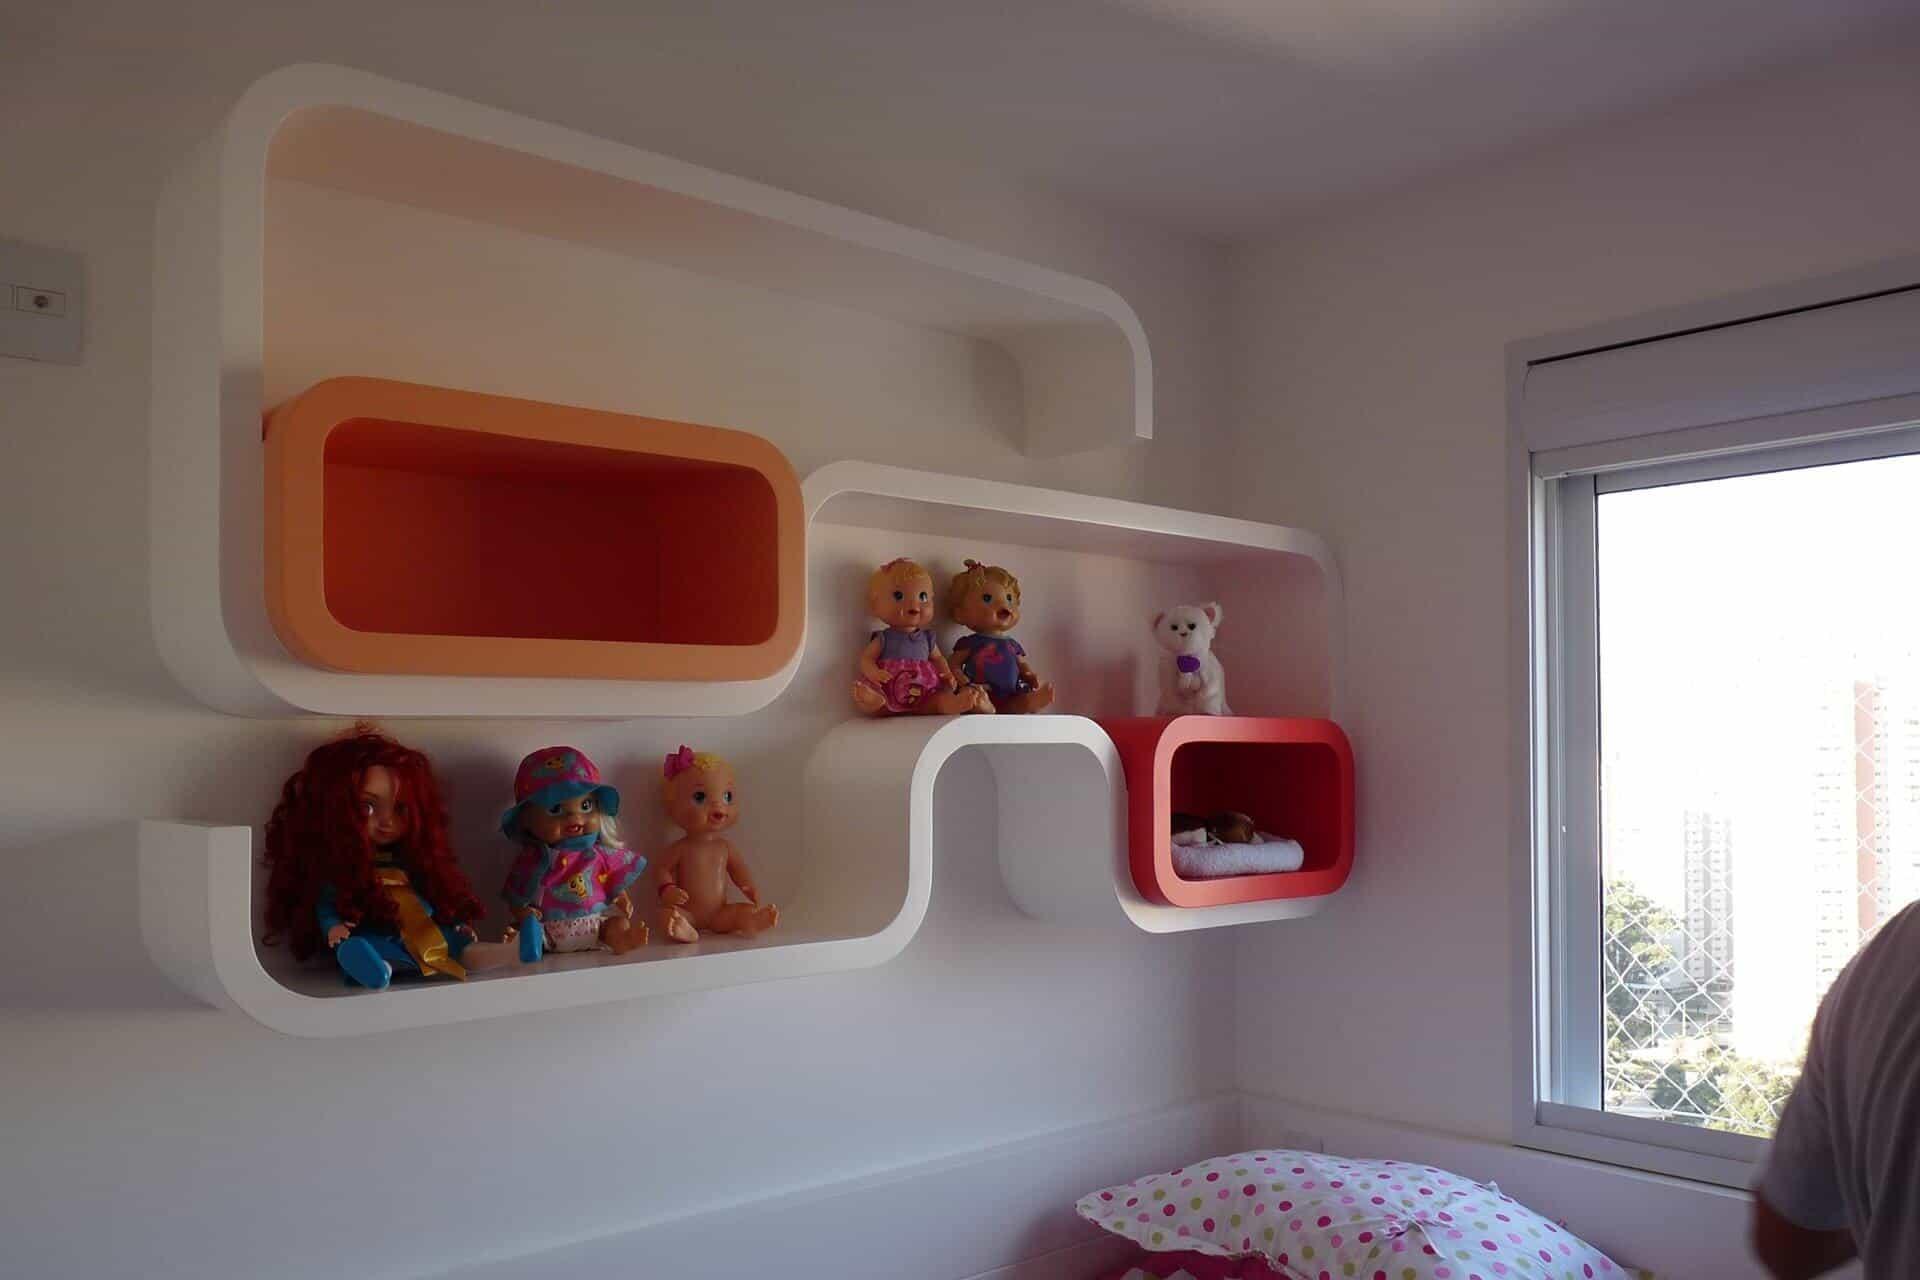 dormitorio-planejado_moveis-sob-medida-galeria-147